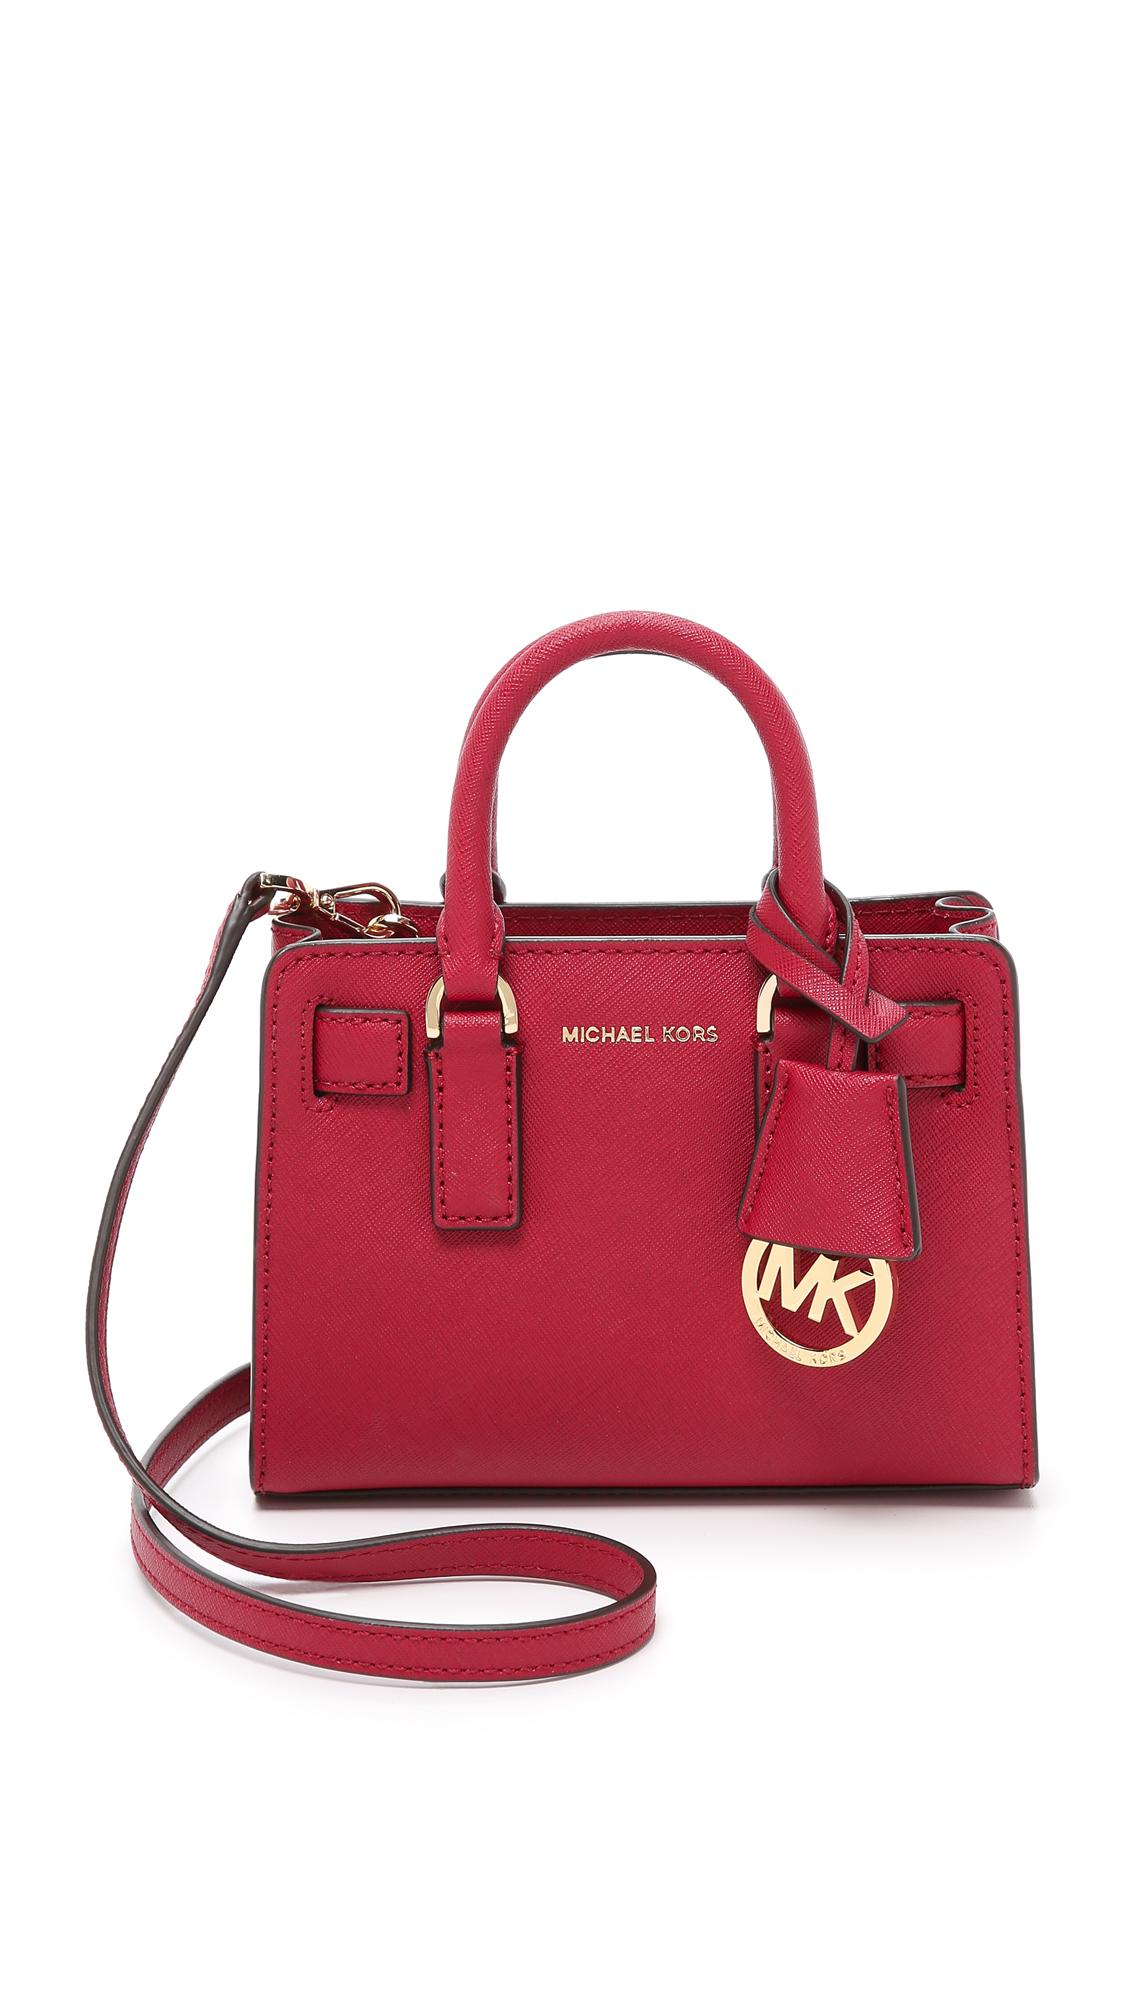 c9f2832de51a MICHAEL Michael Kors Dillon Extra Small Cross Body Bag - Cherry in ...